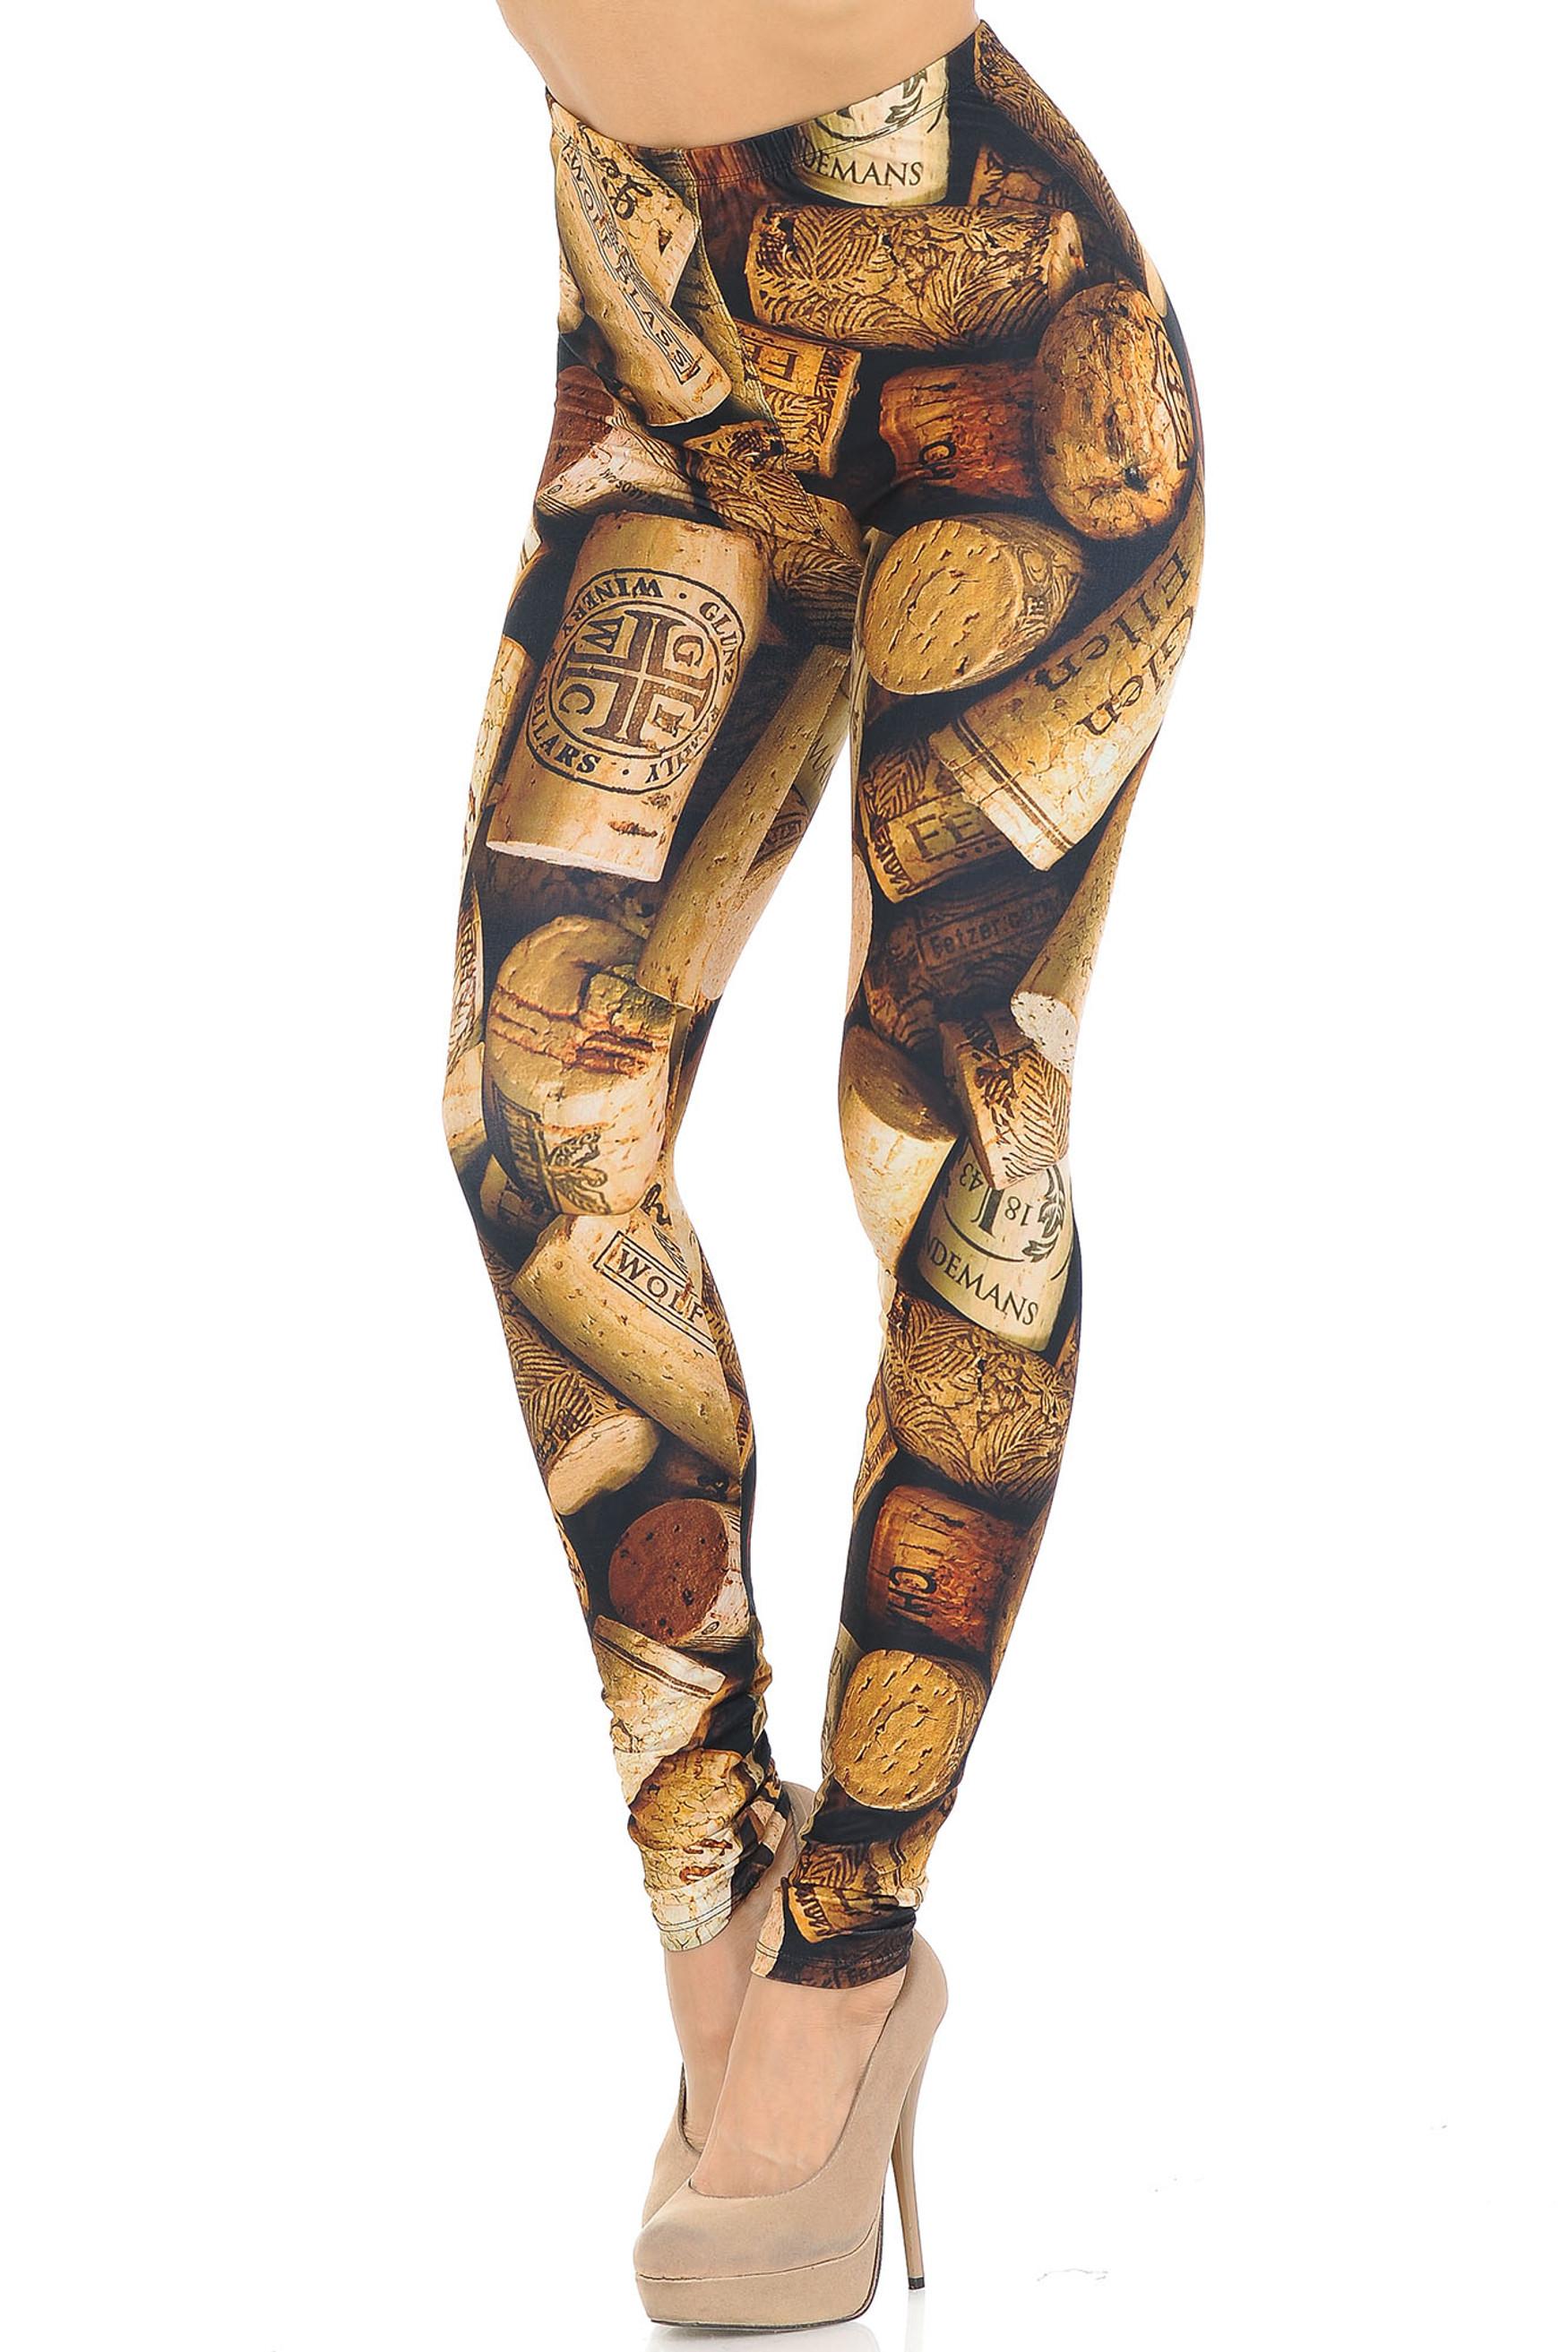 Creamy Soft Wine Cork Extra Small Leggings - USA Fashion™